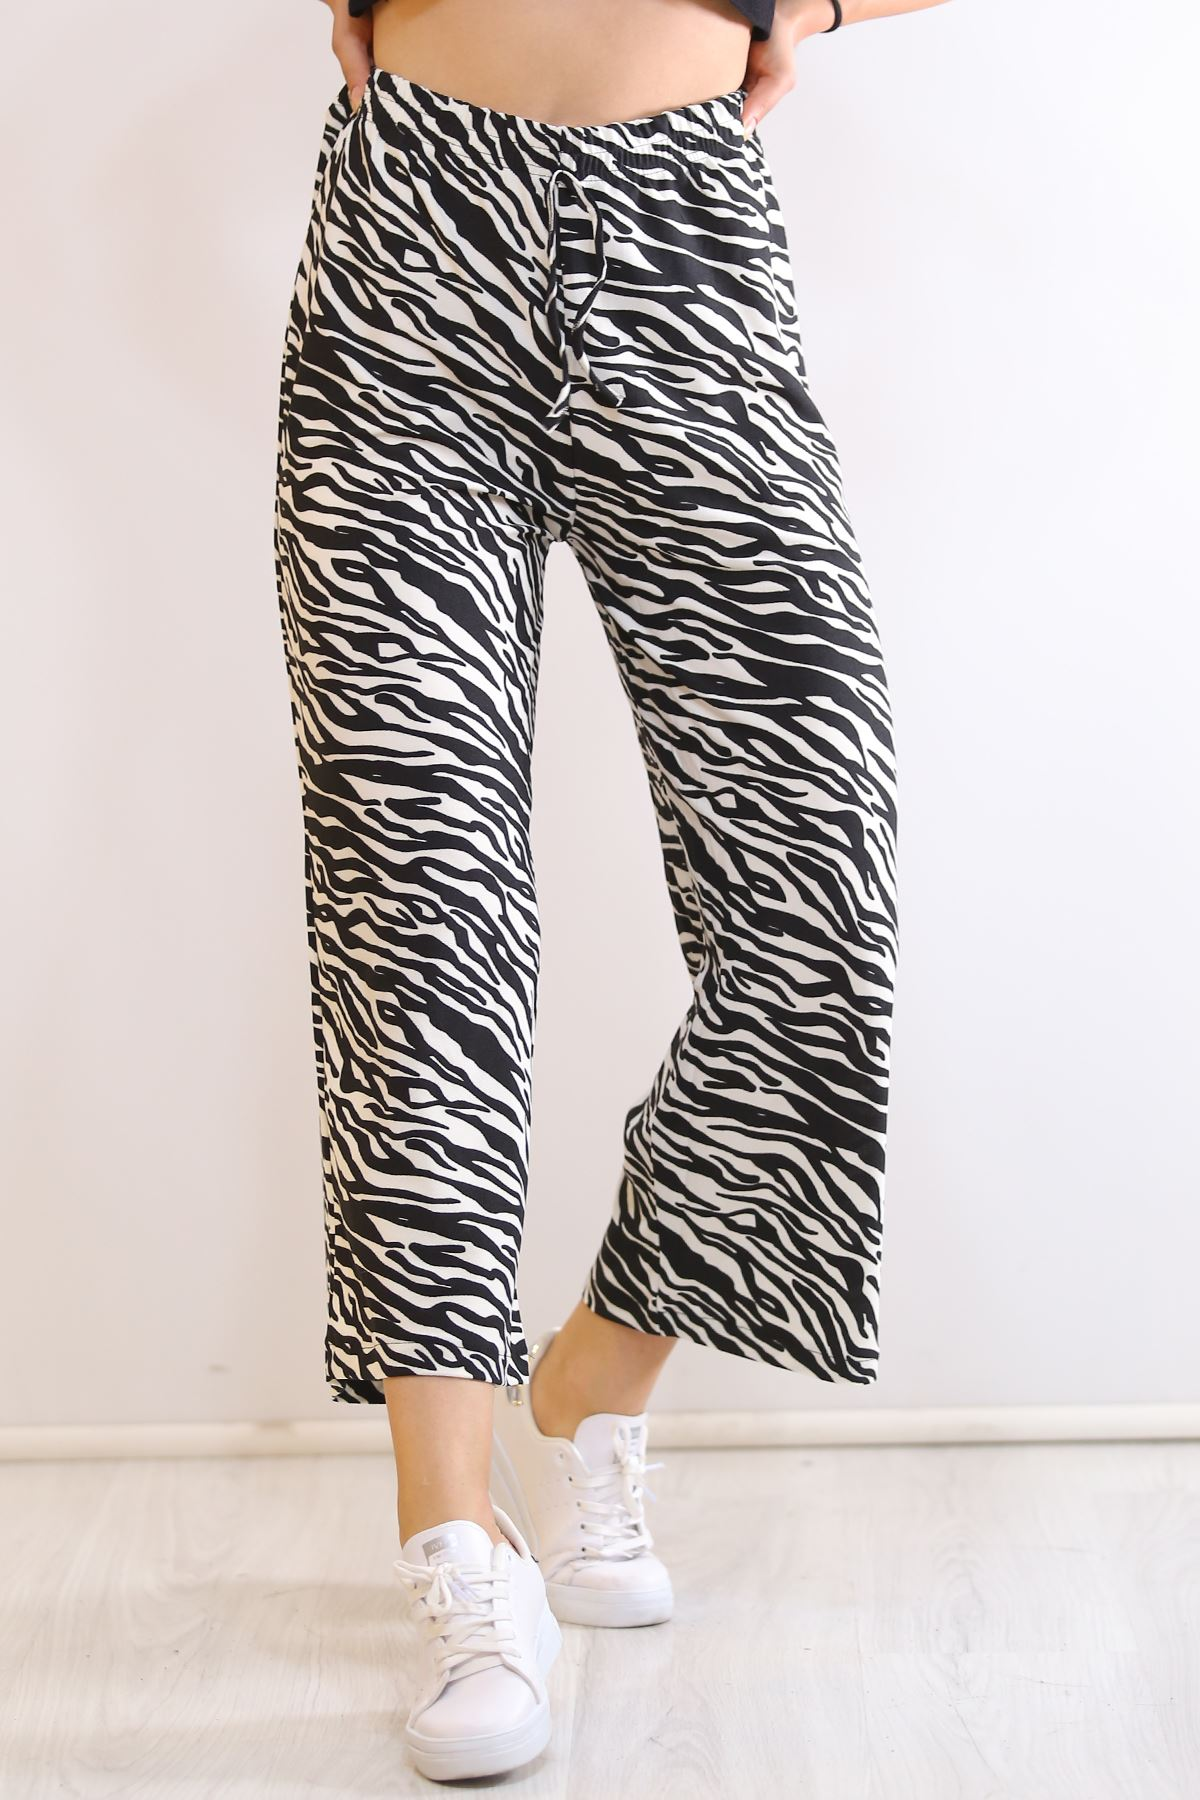 Örme Krep Pantolon Zebra - 19276.200.